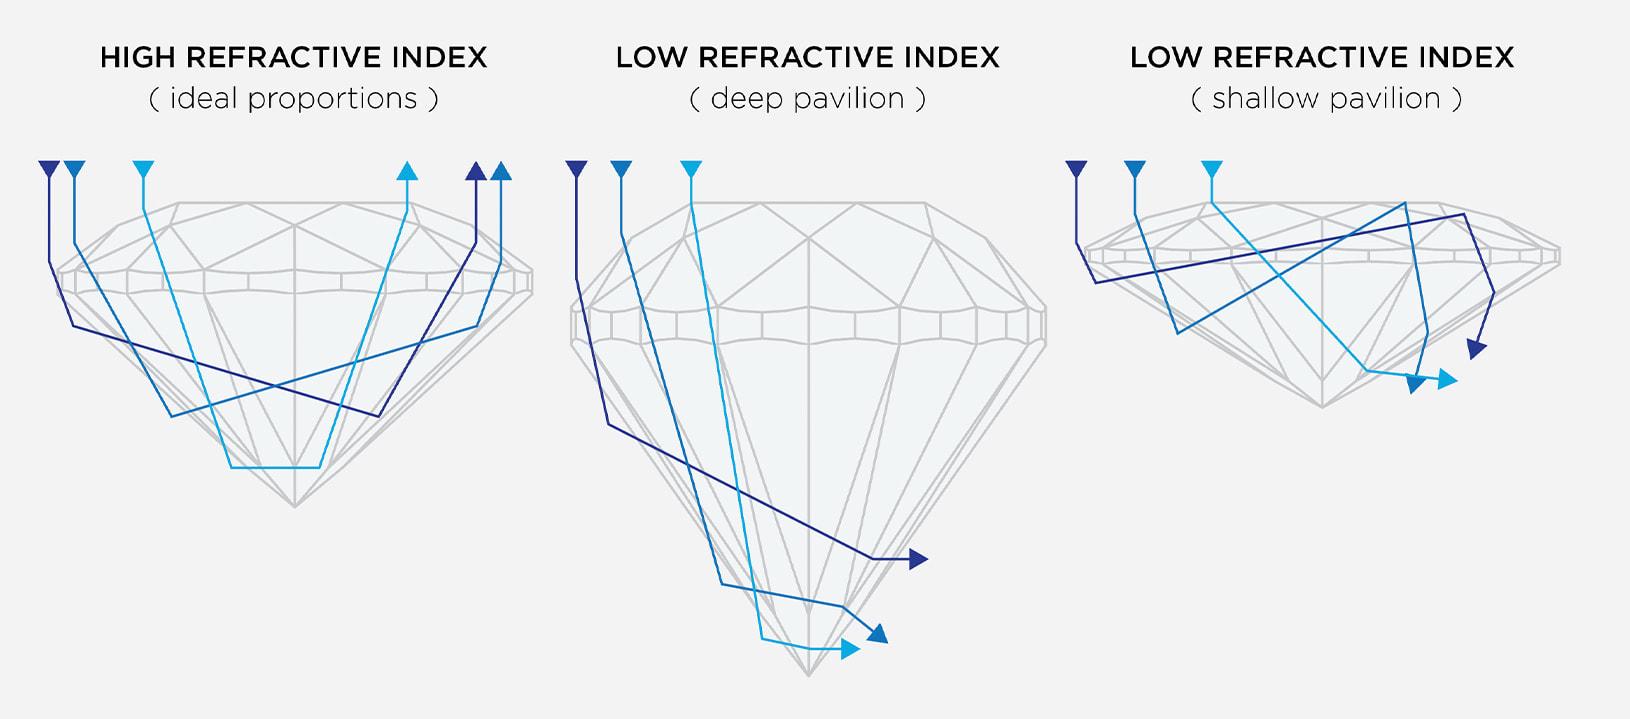 Depiction of high refractive index & low refractive index